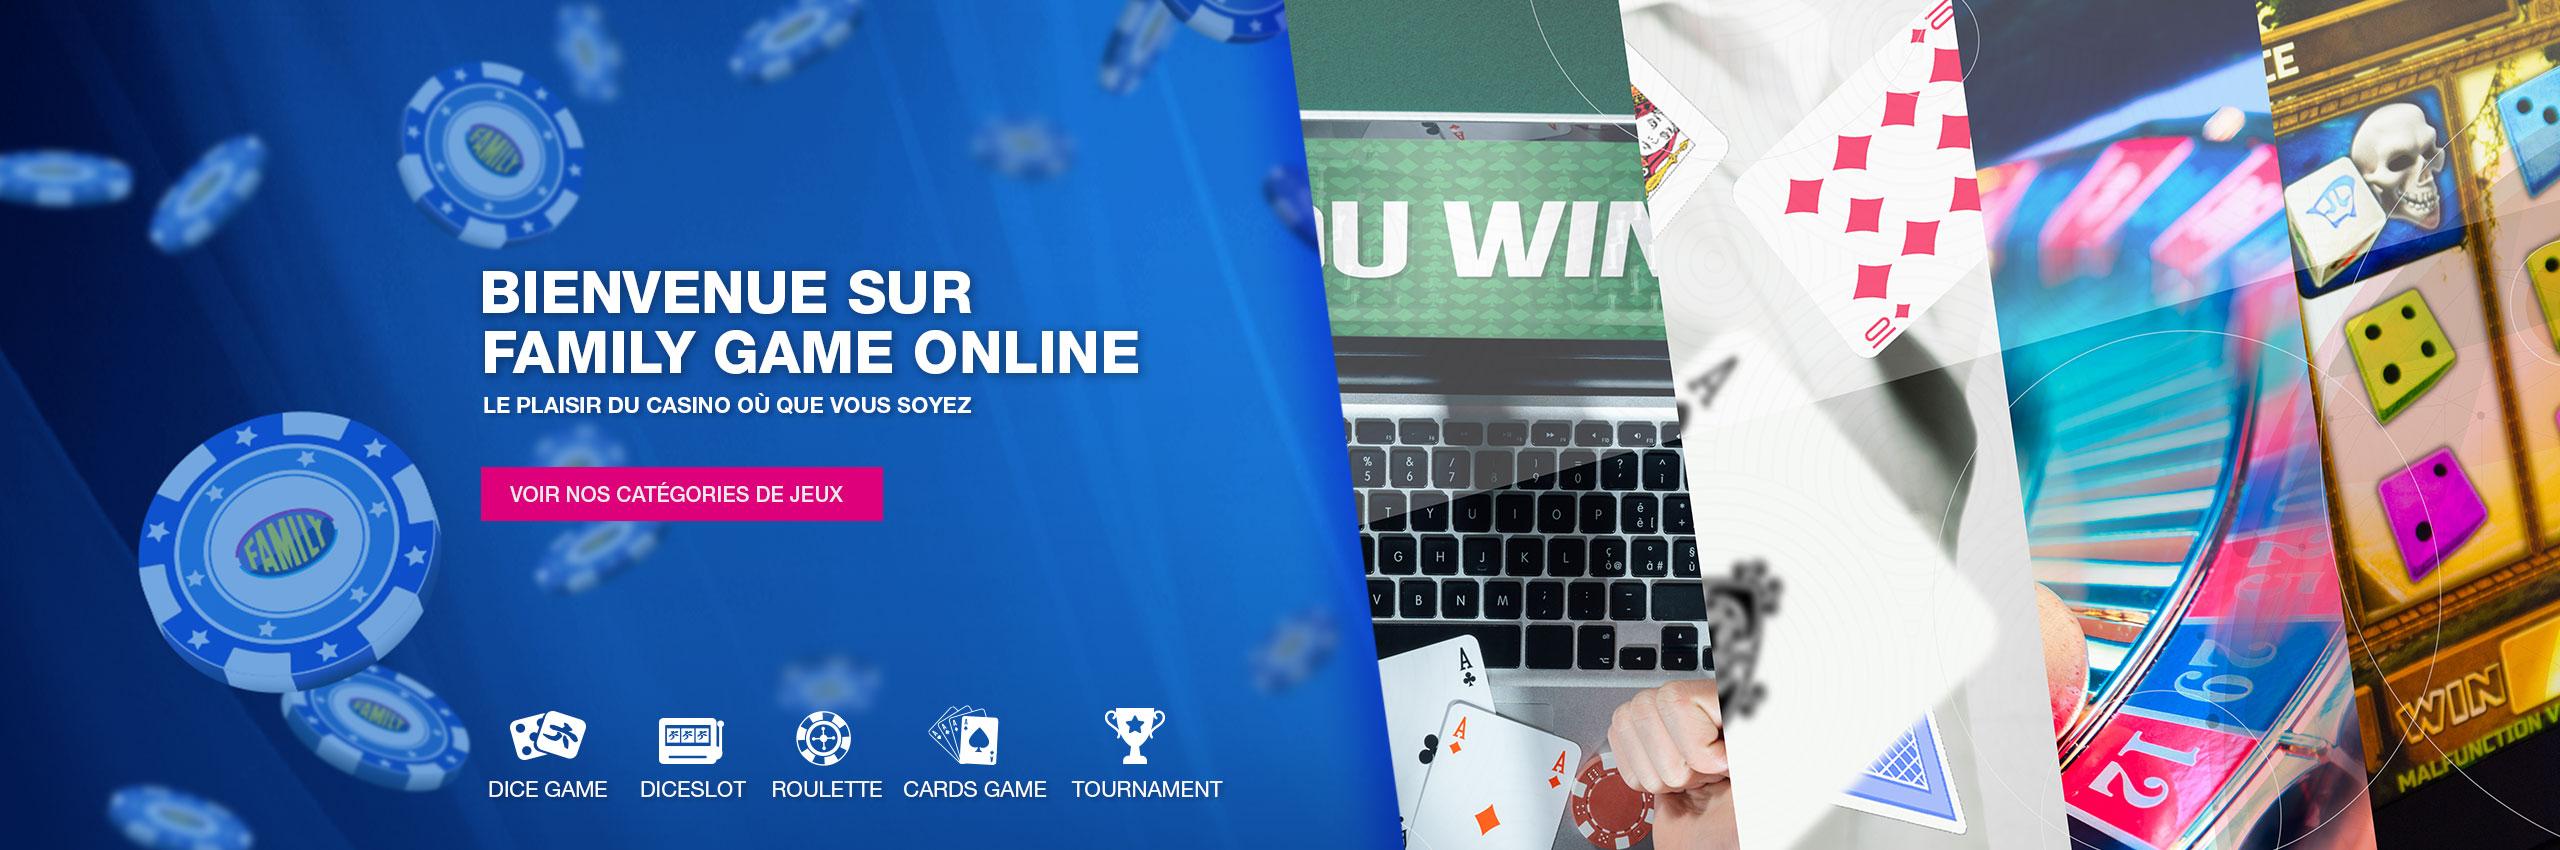 jeux de casino en ligne belge